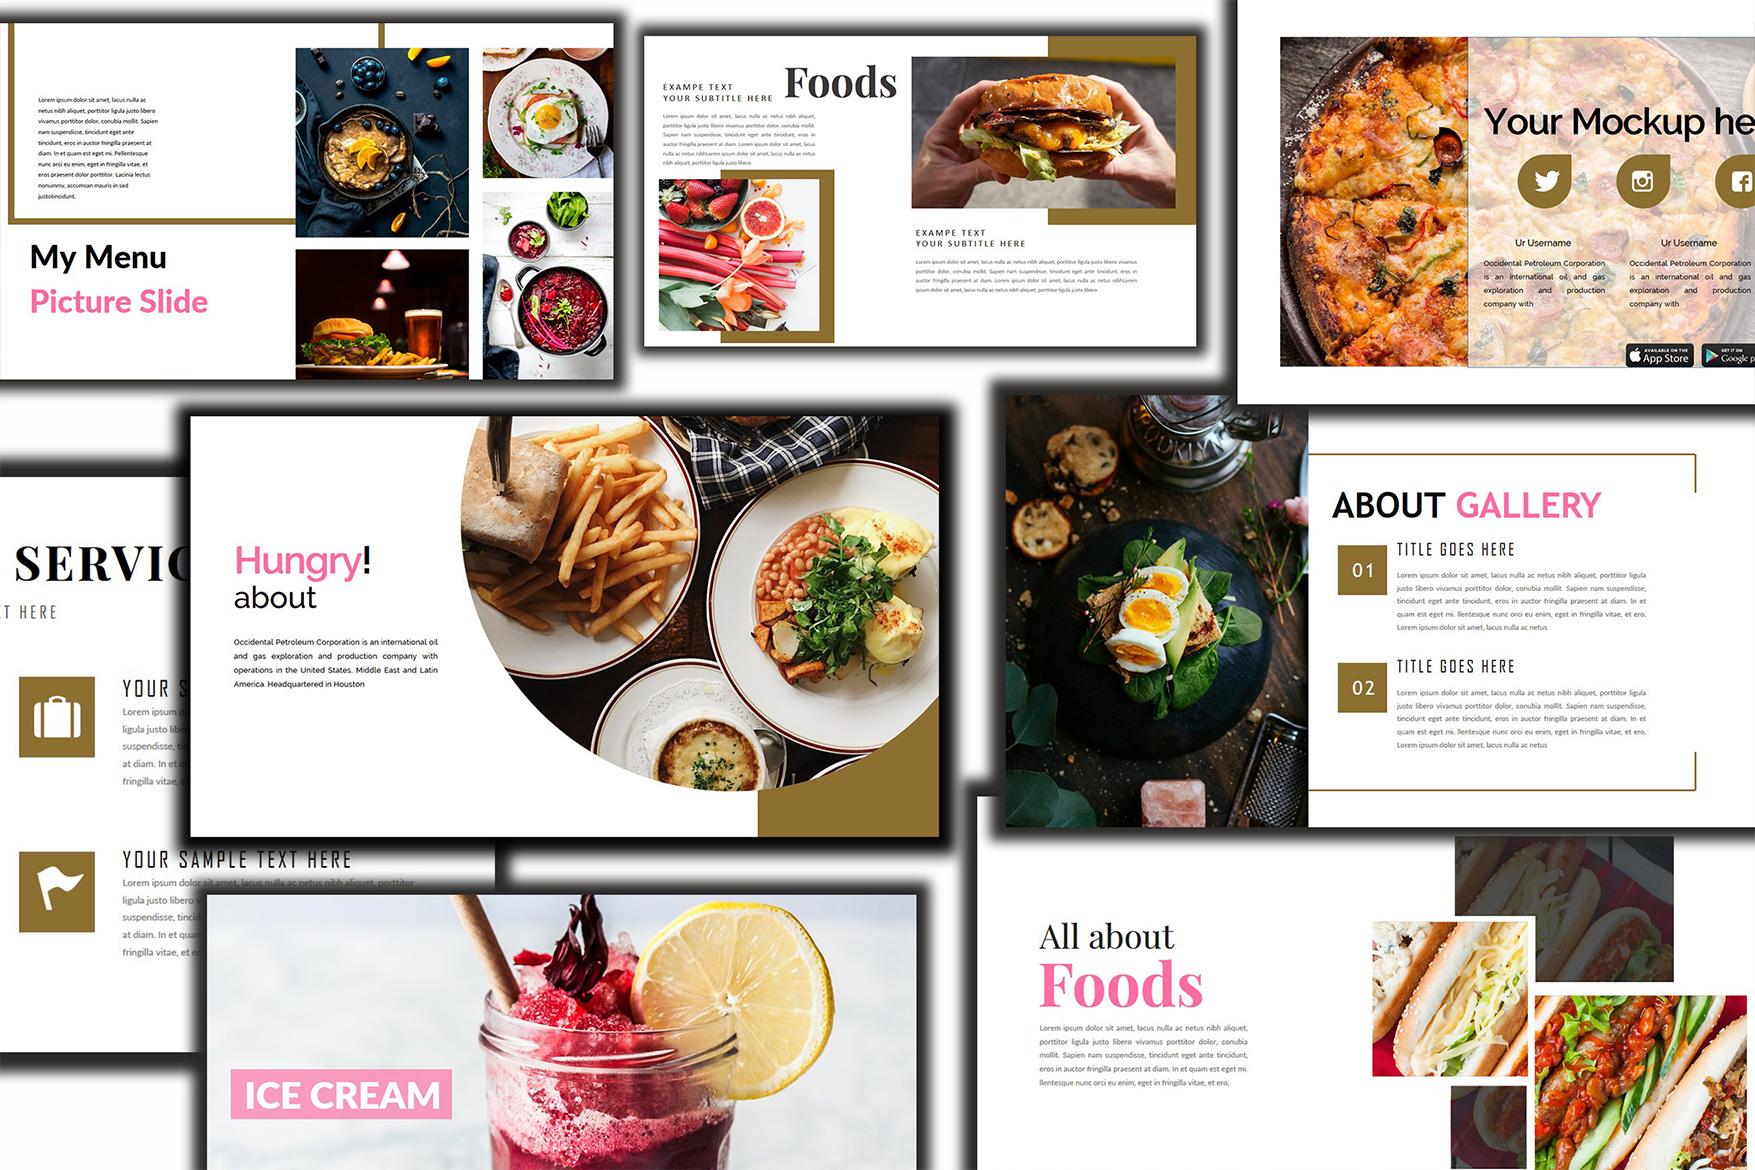 Delicious Food - Google Slides Presentation example image 1